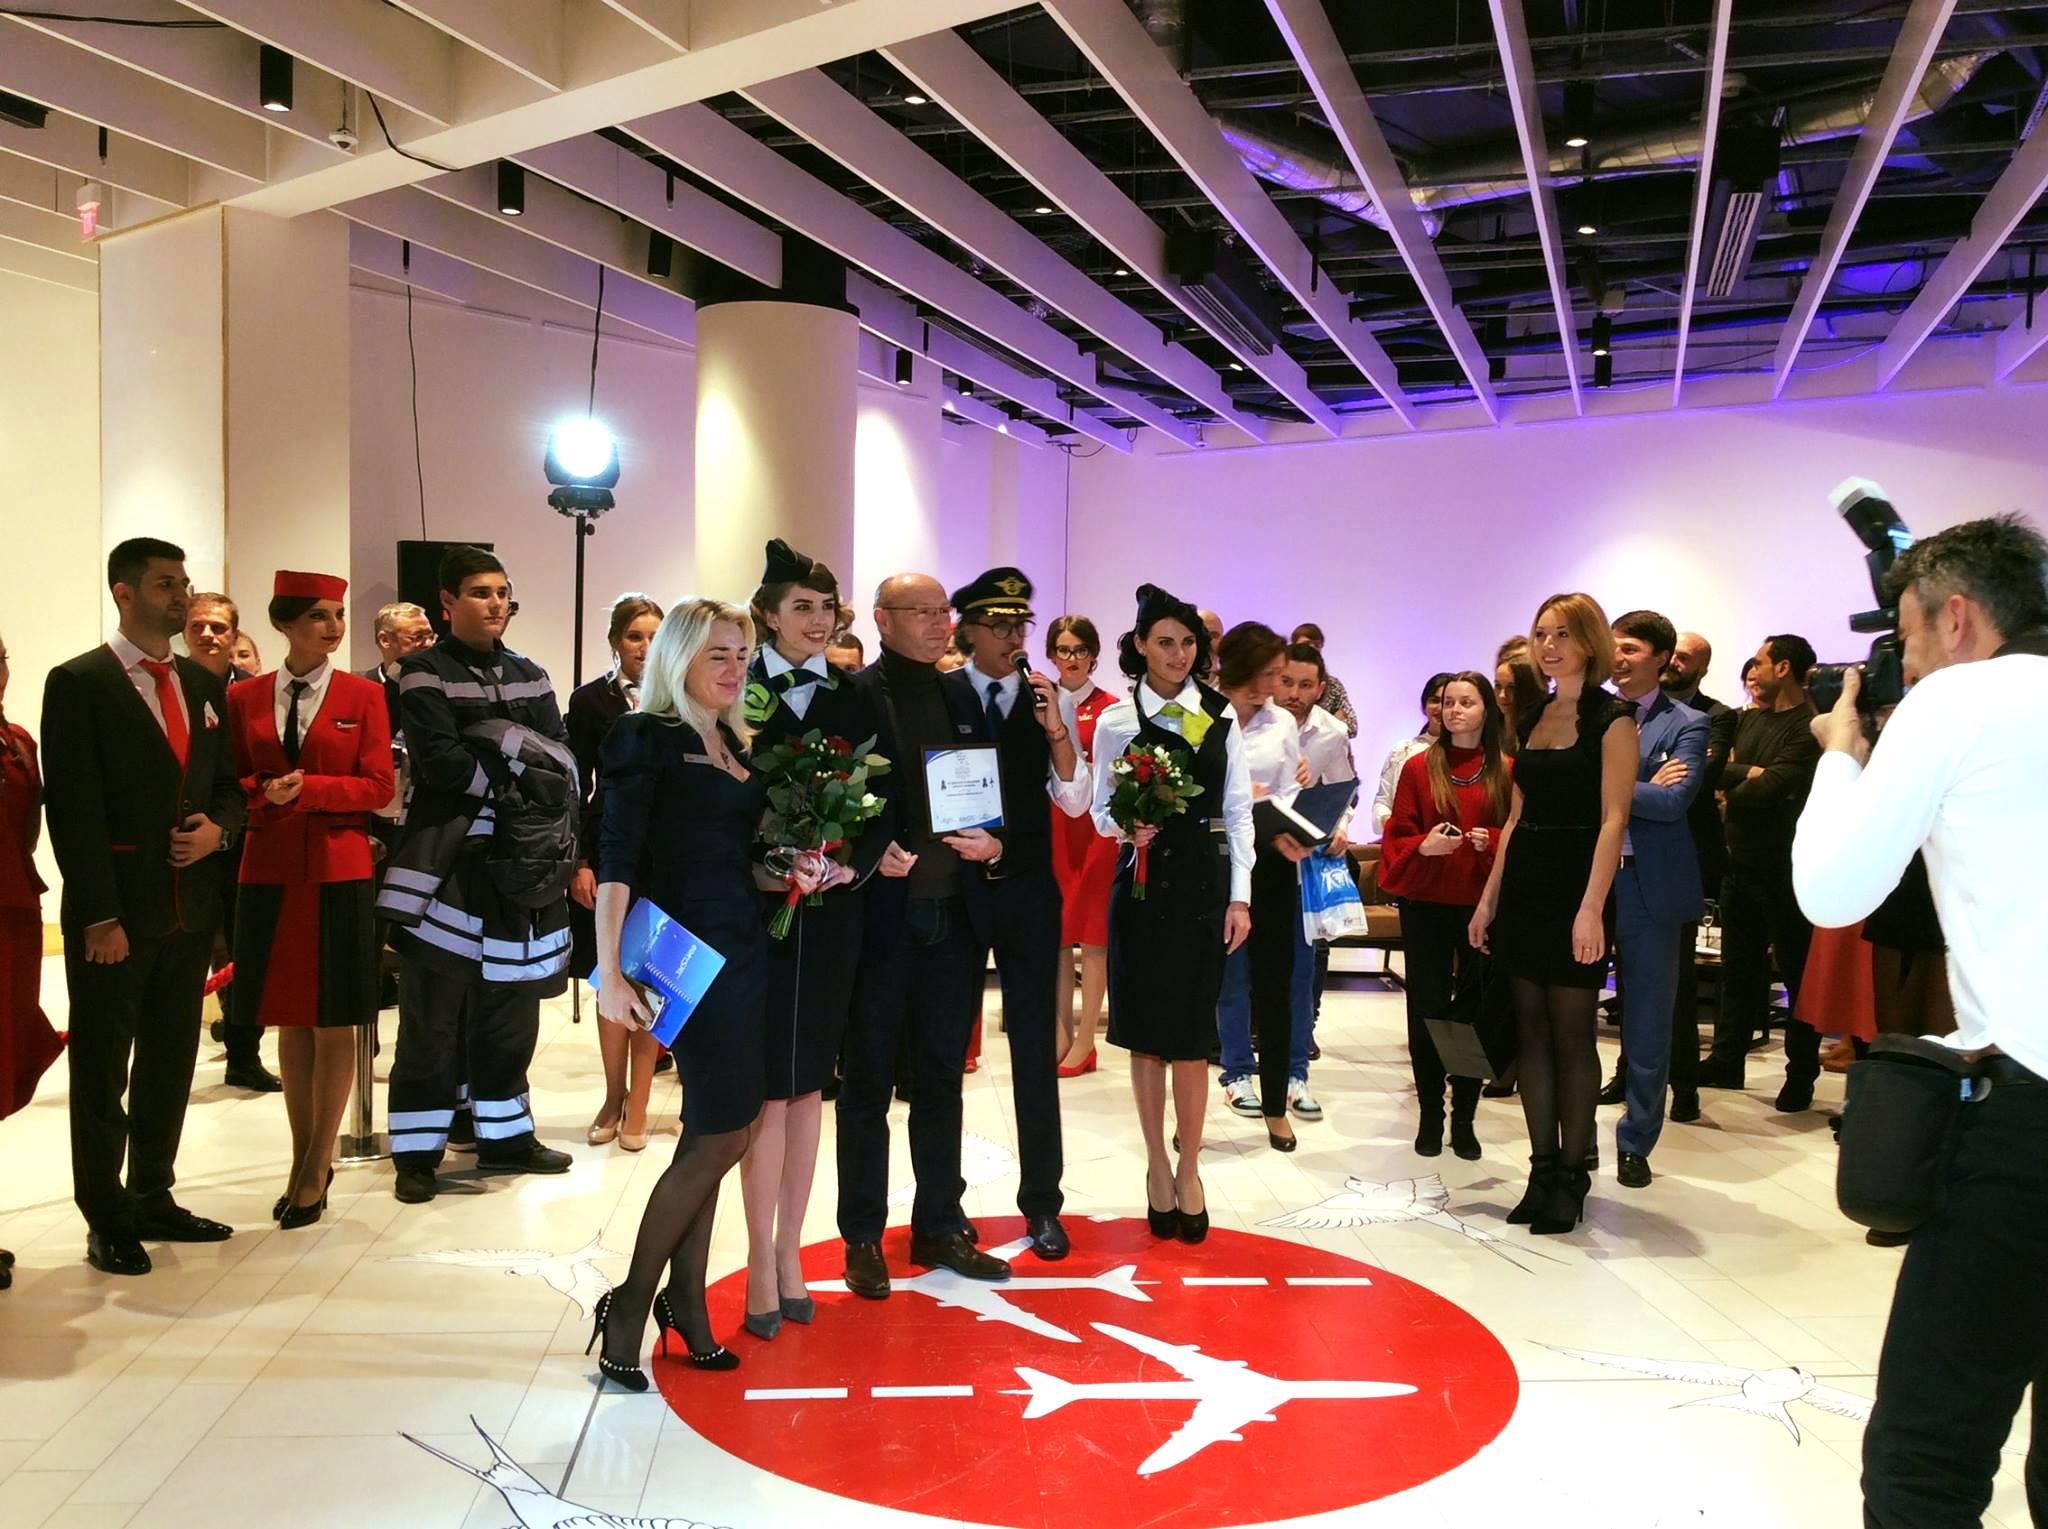 Авиамода и финал Sky Swallows 2017 в Киеве